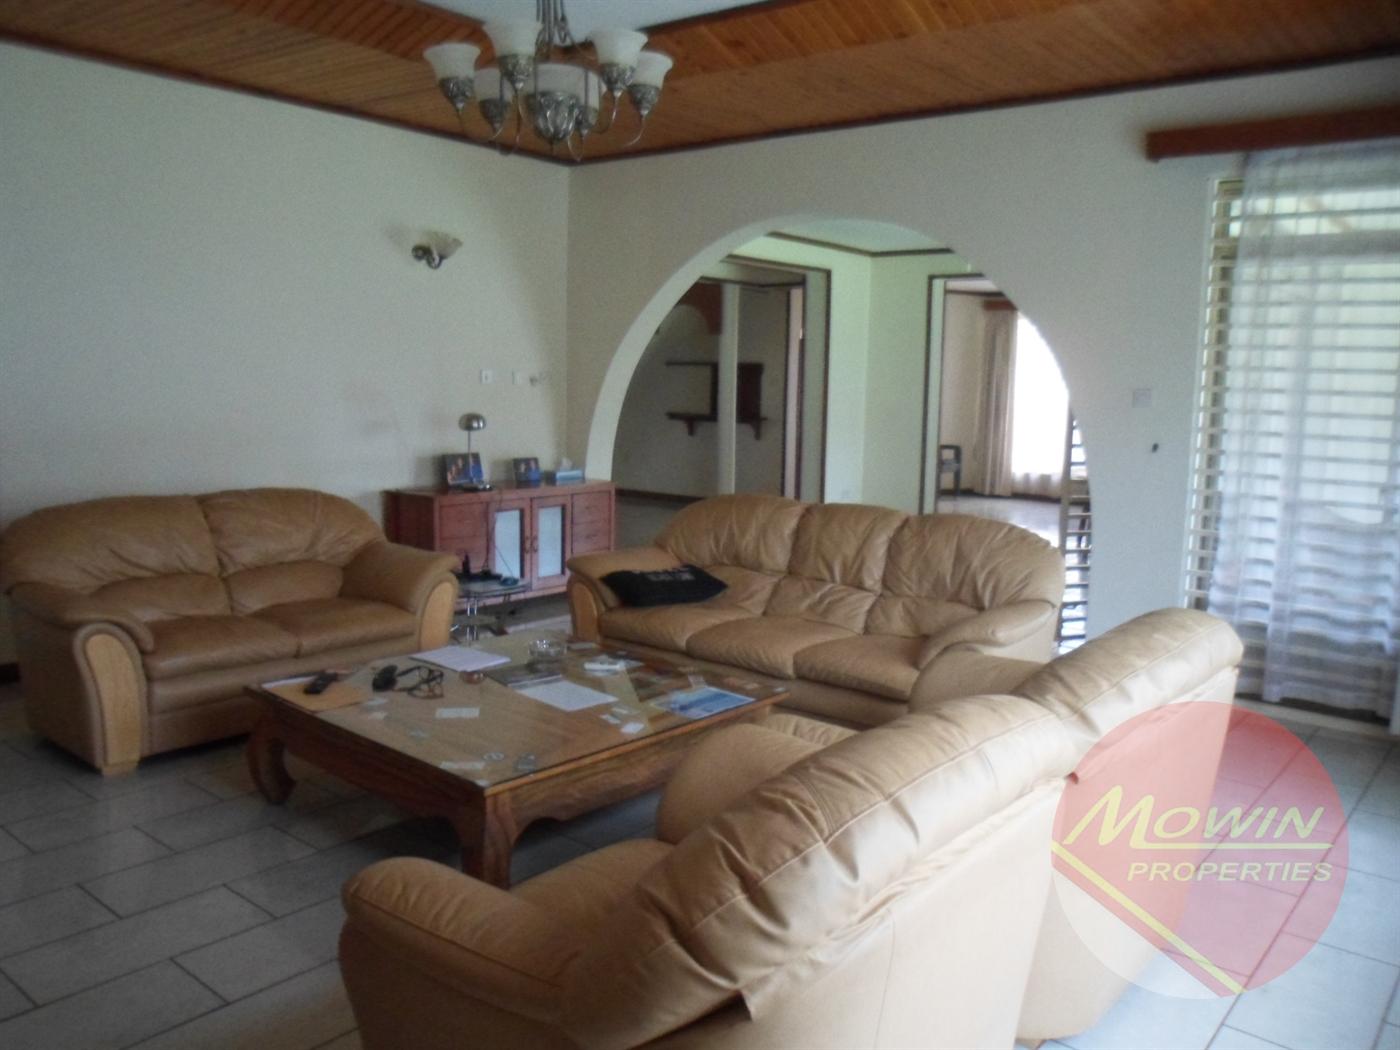 Villa for rent in Bugolobi Kampala